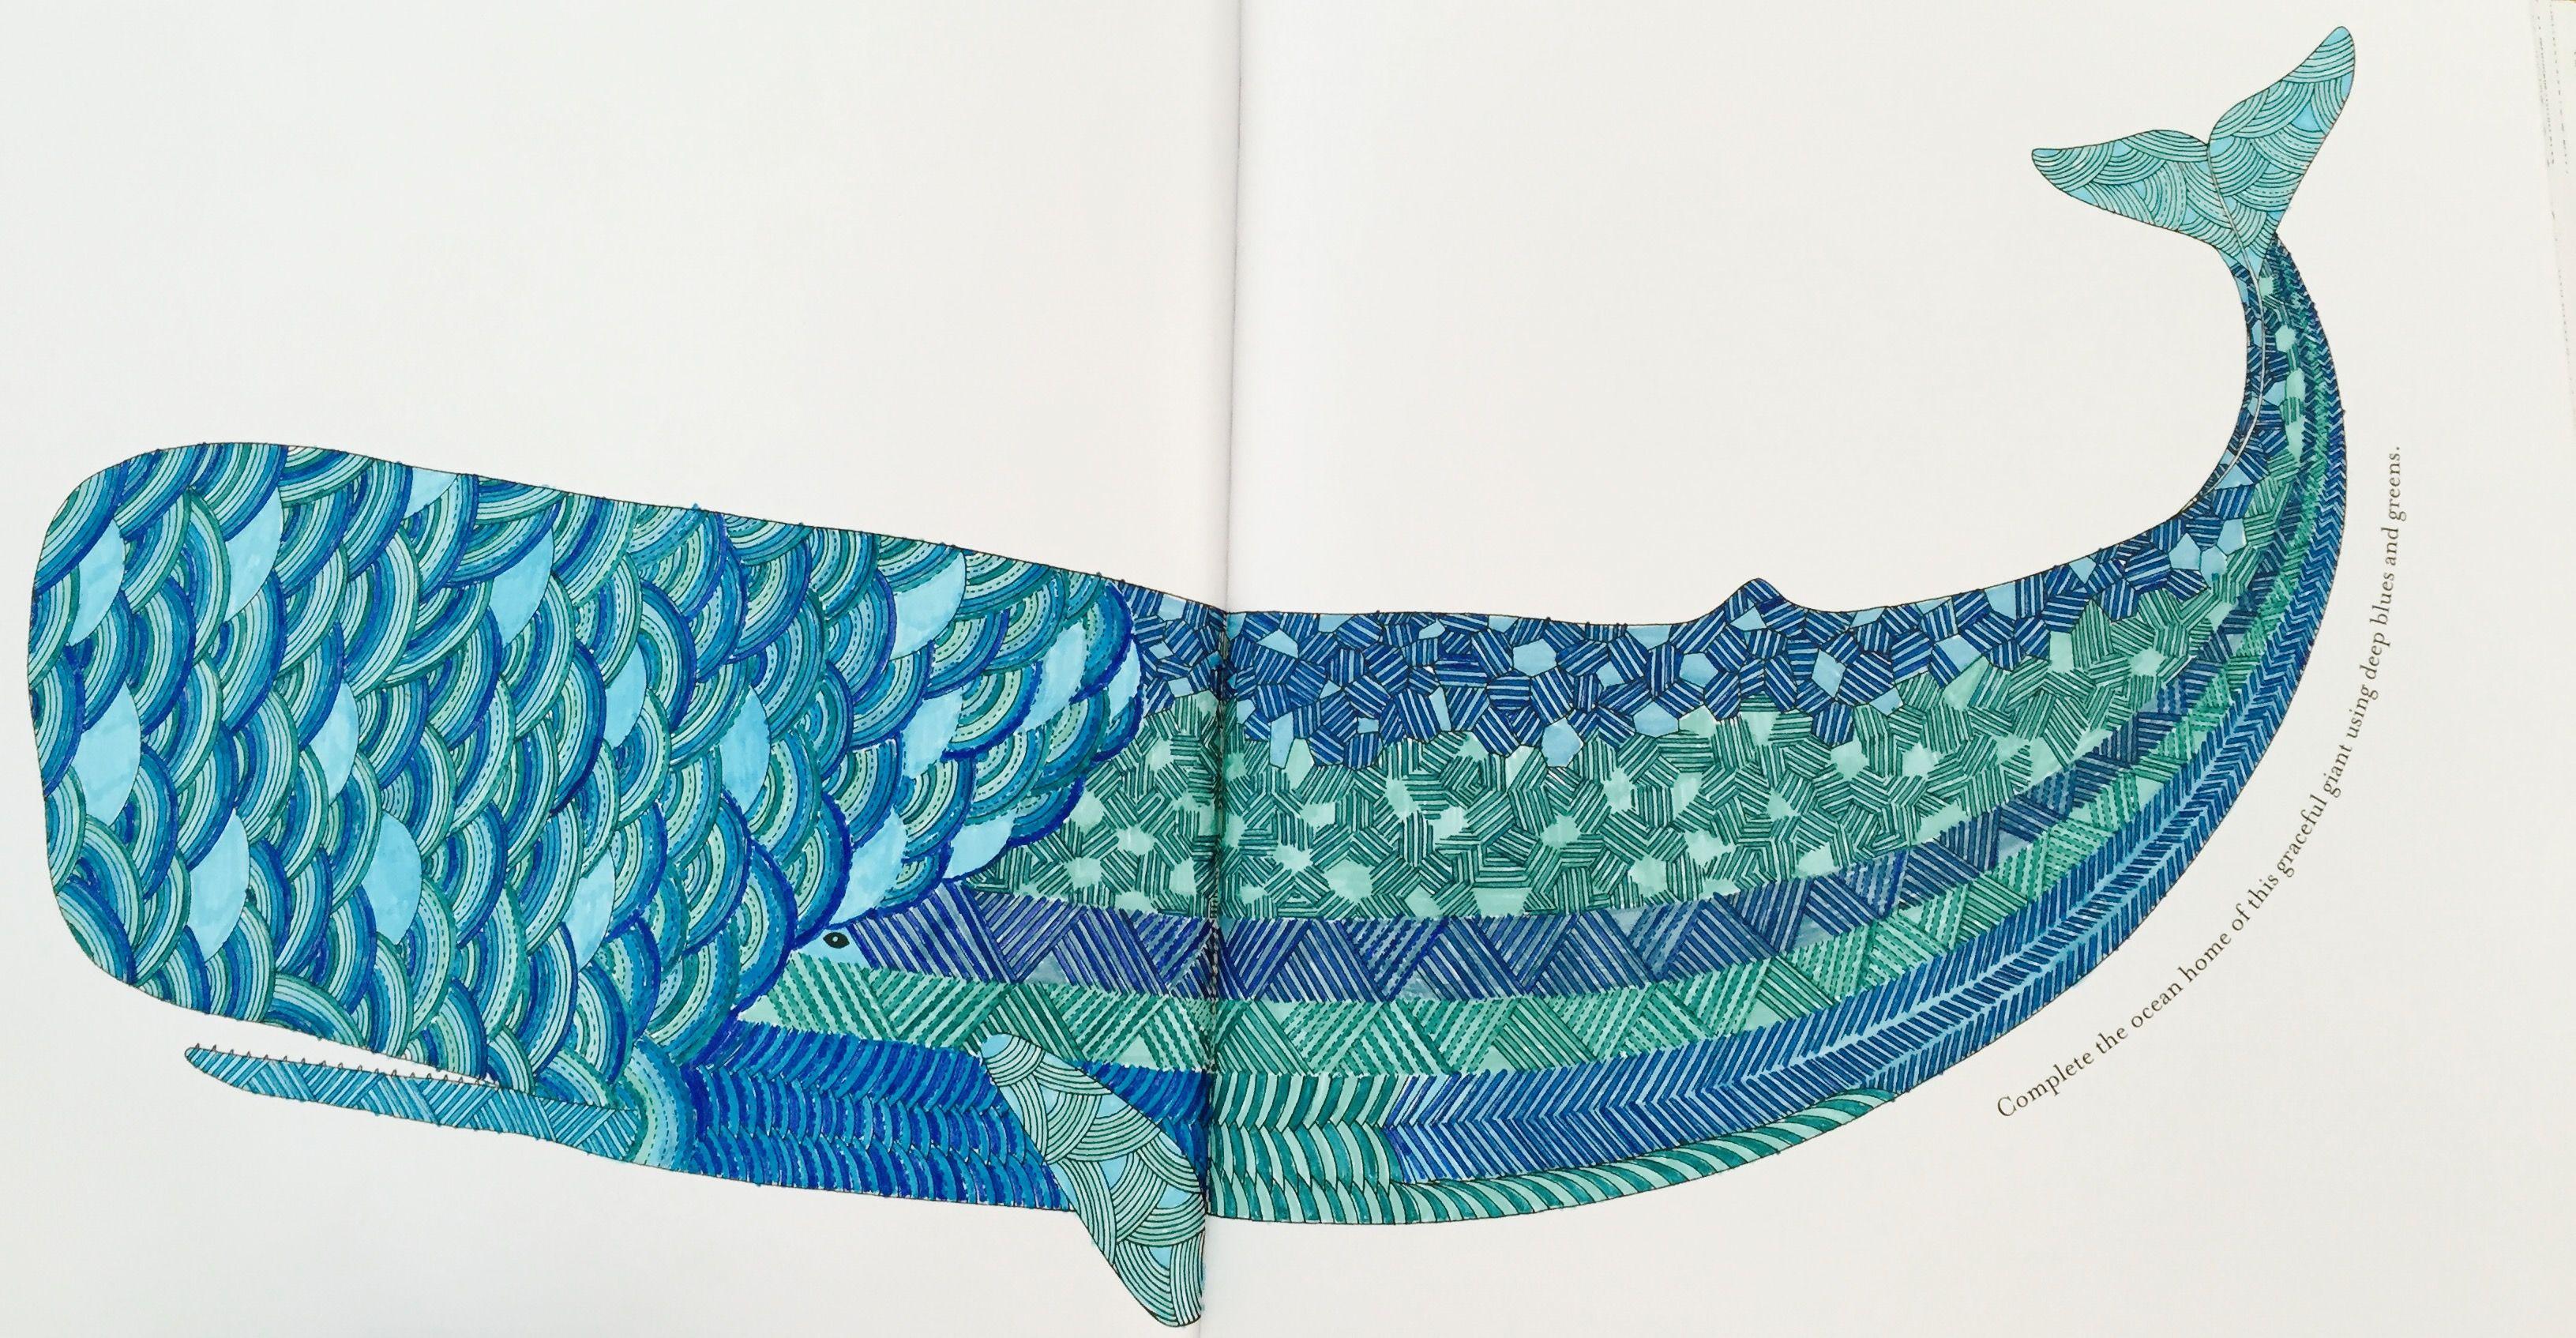 Millie Marotta Animal Kingdom Whale Using Connector Pens